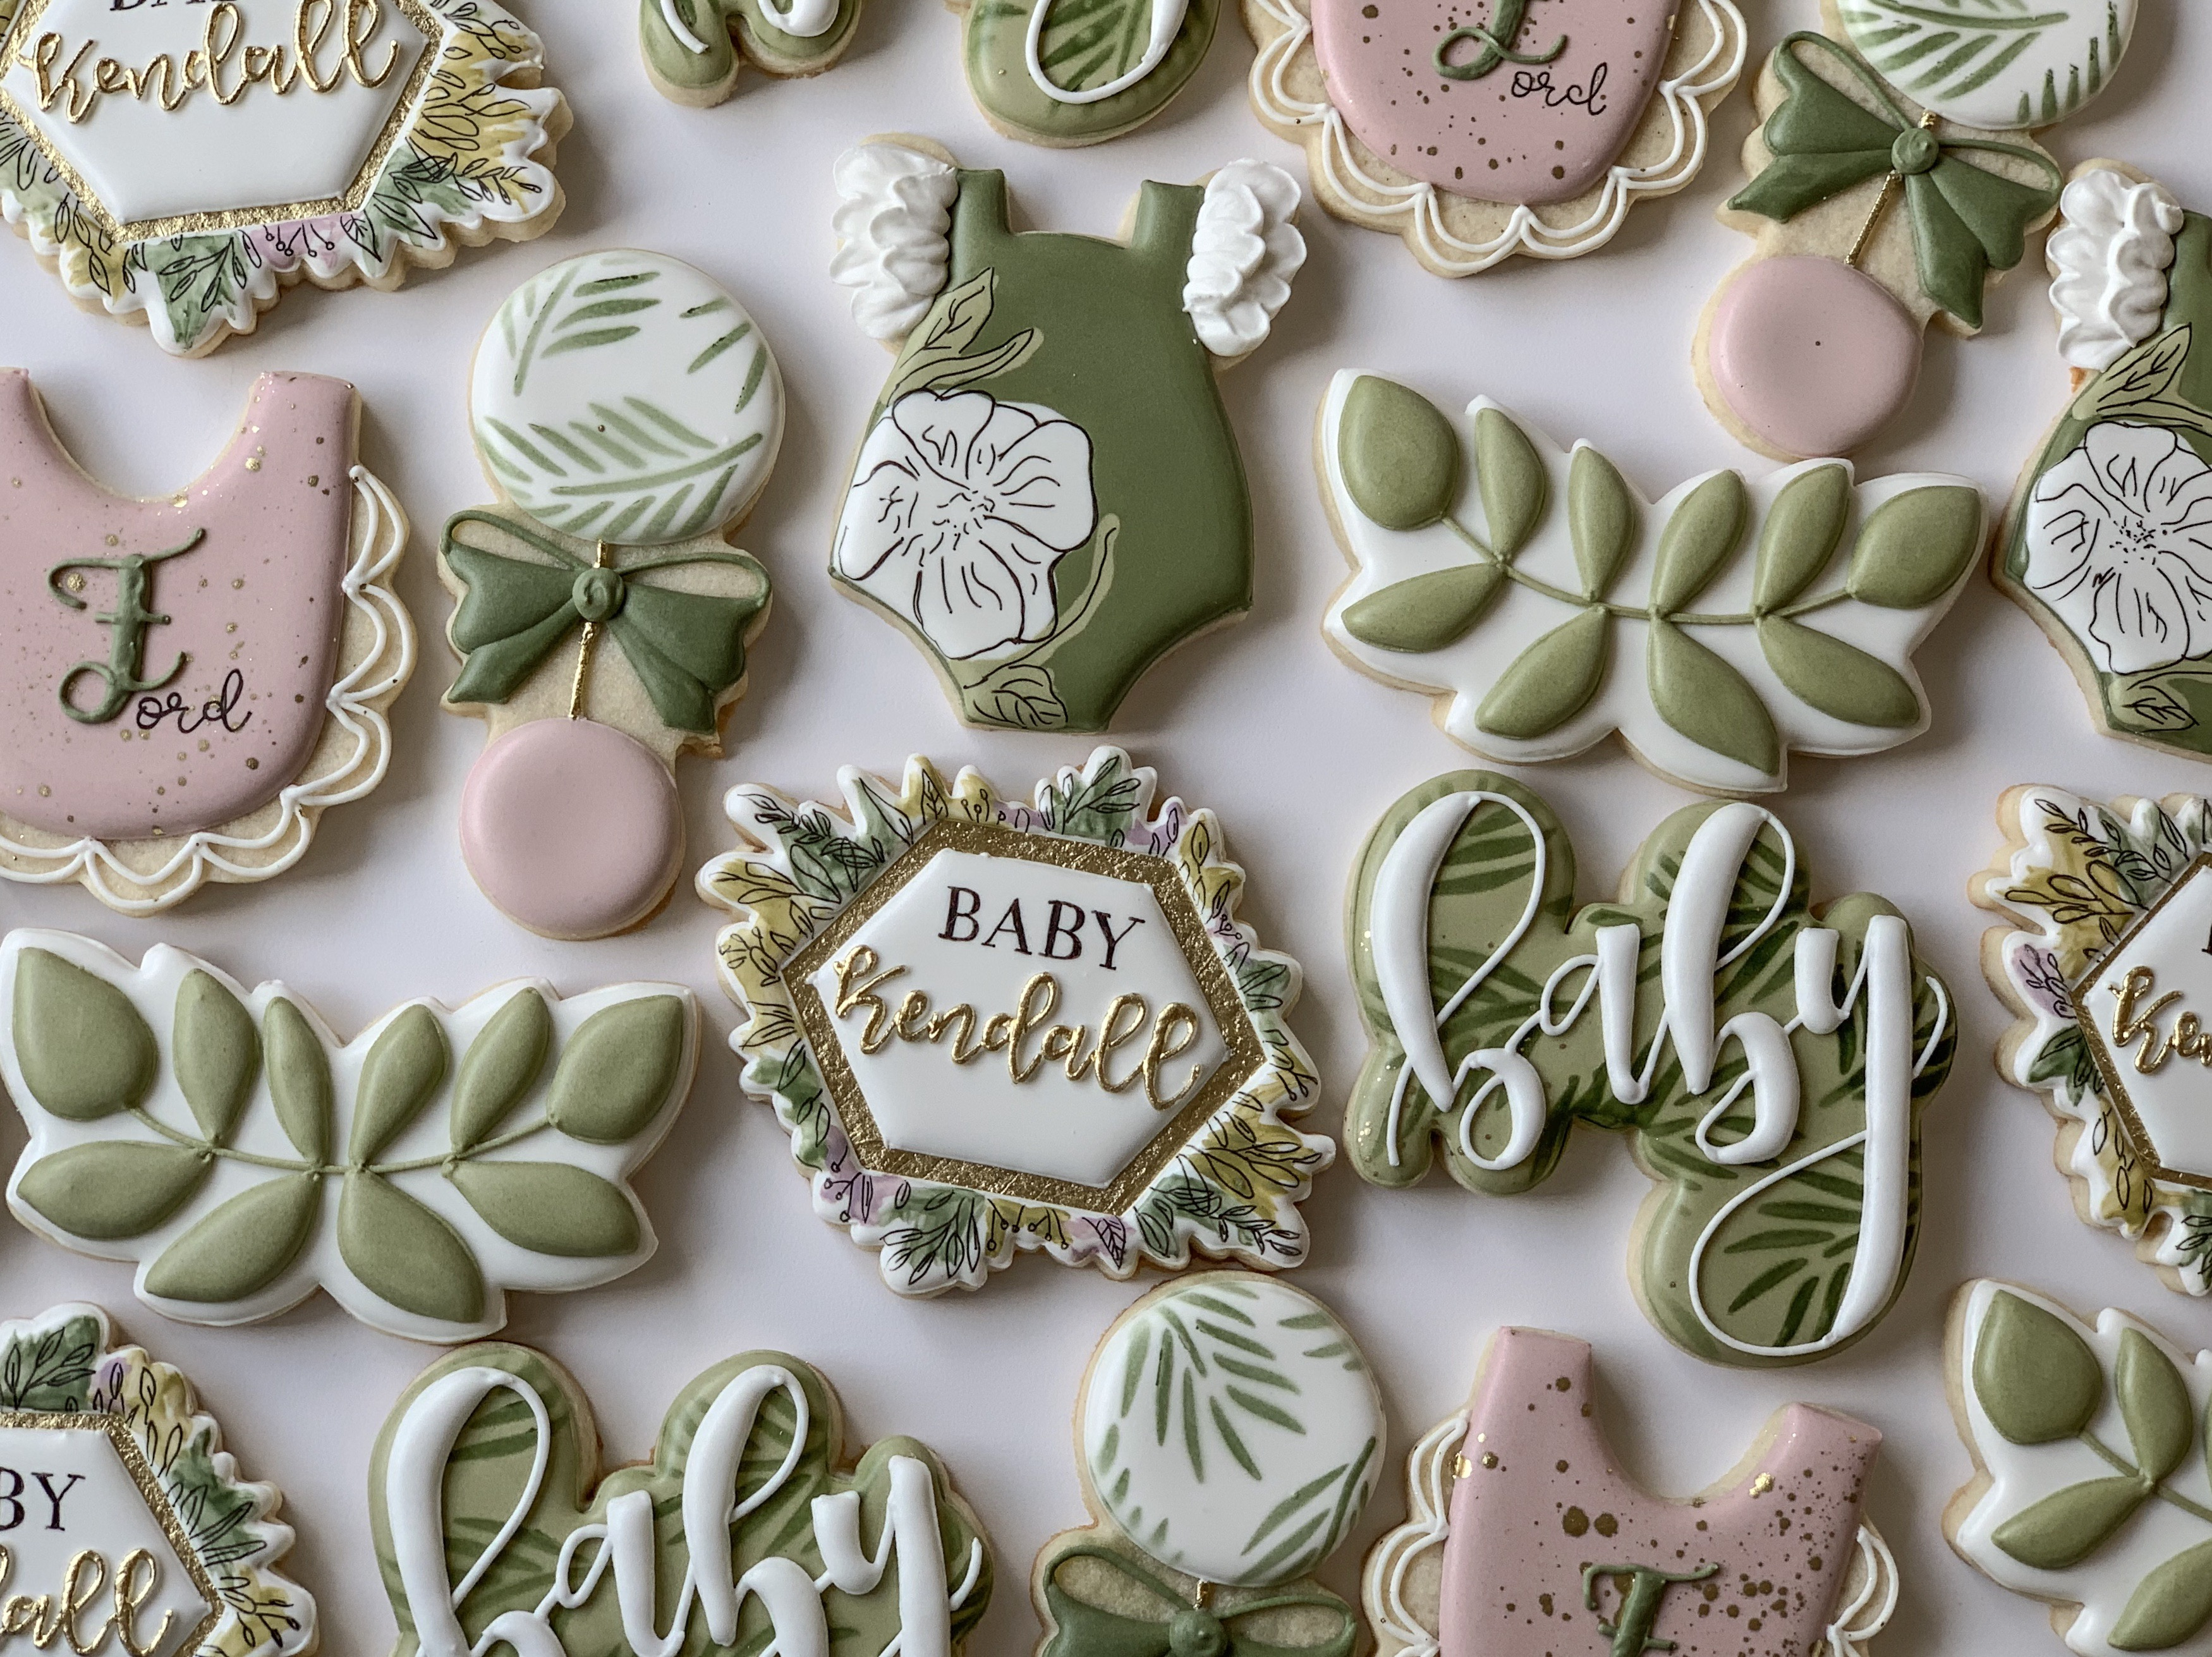 greenery cookies